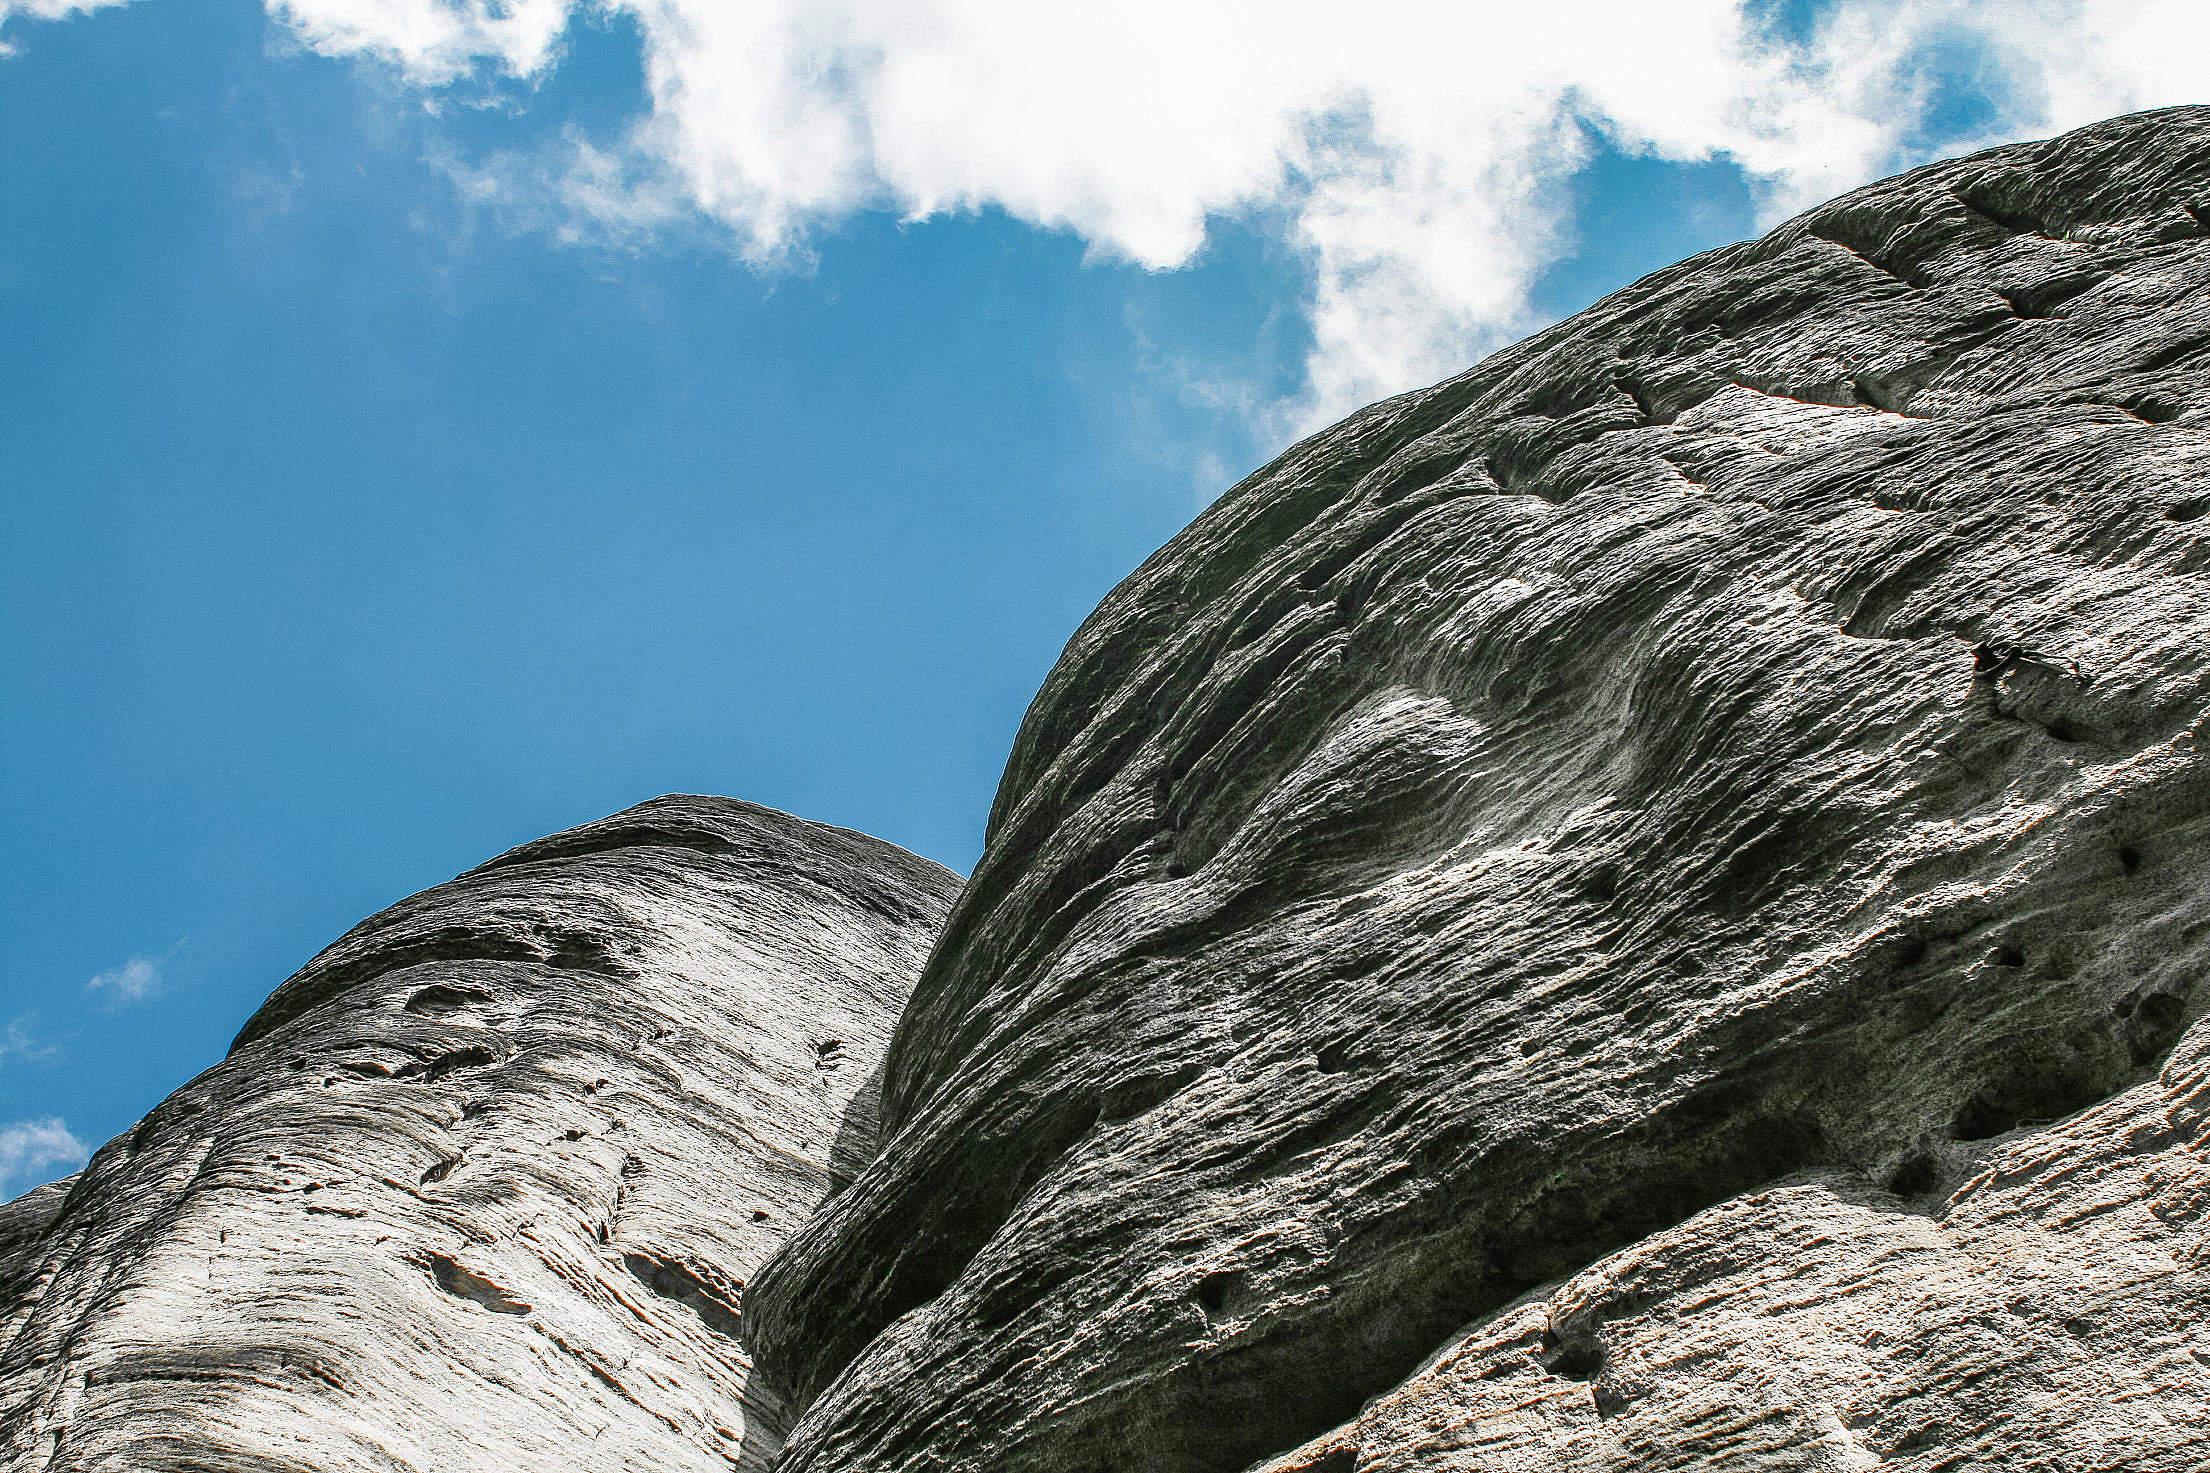 Blue Sky, White Rocks Free Stock Photo